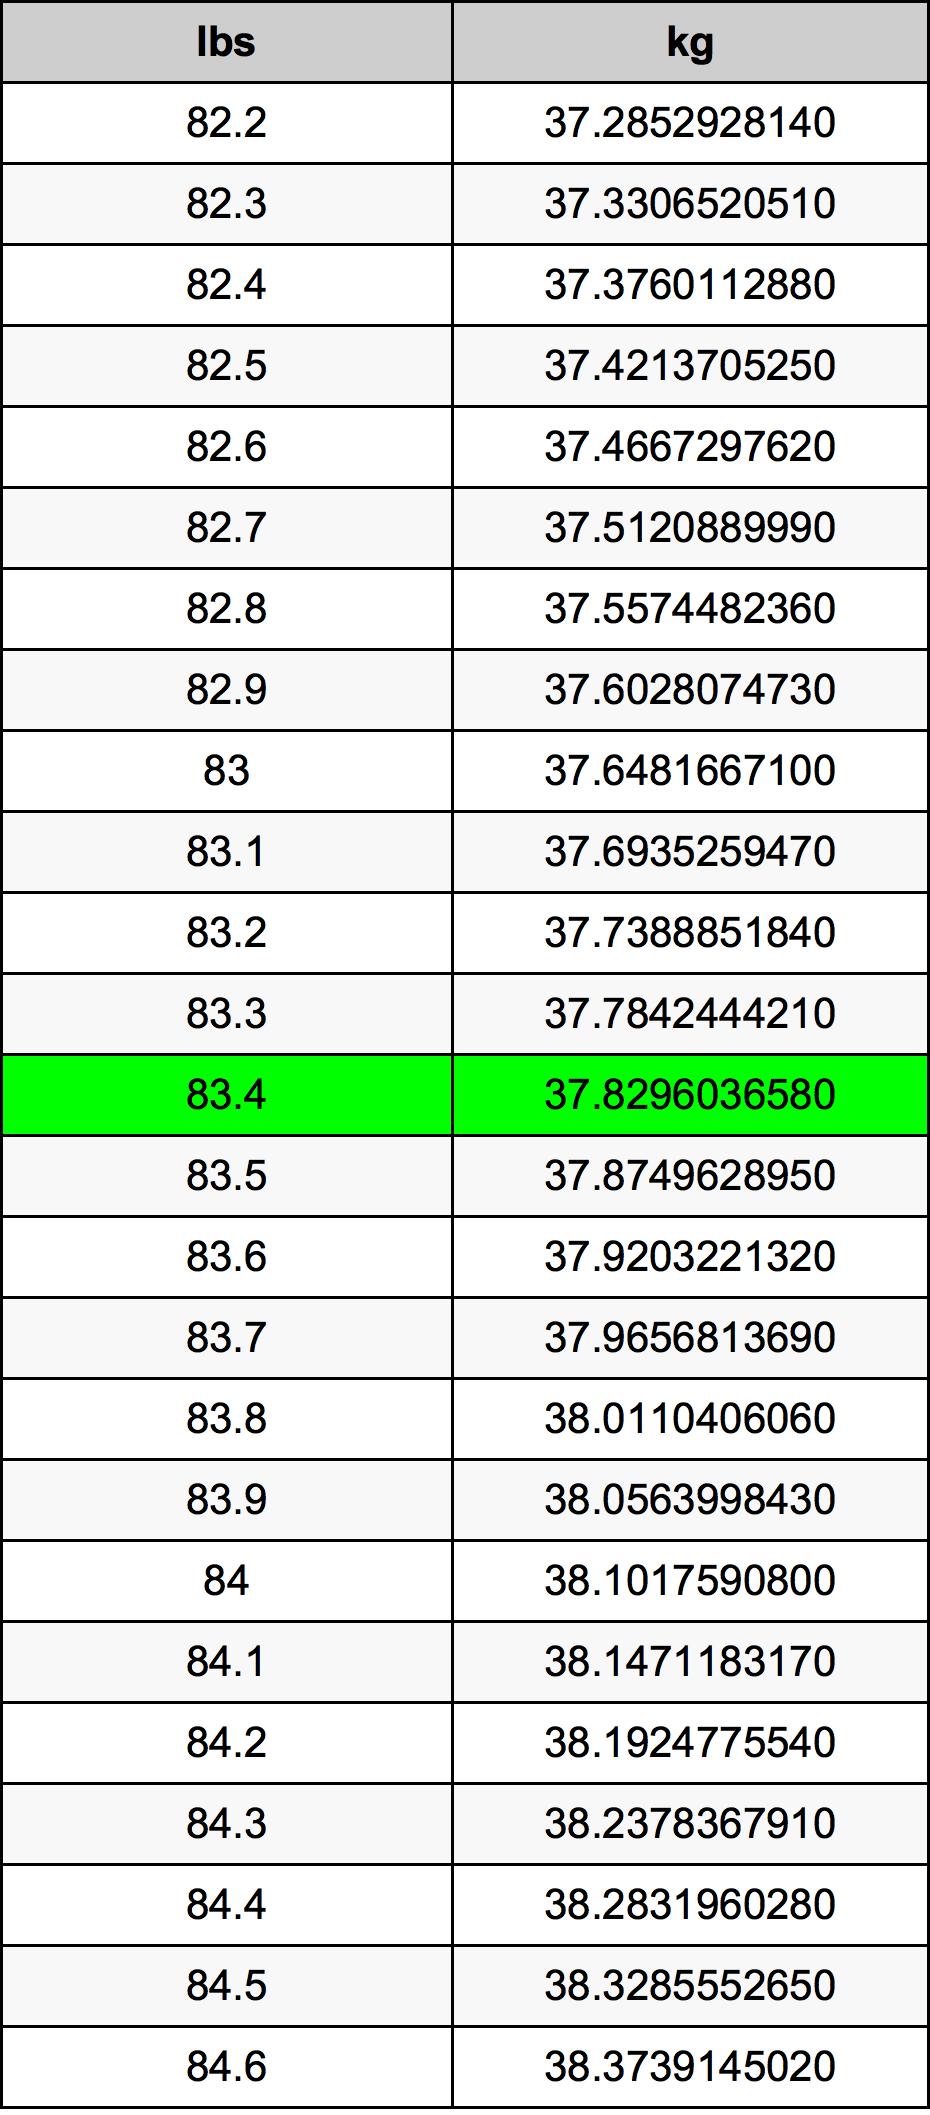 83.4 Libra konverteringstabellen